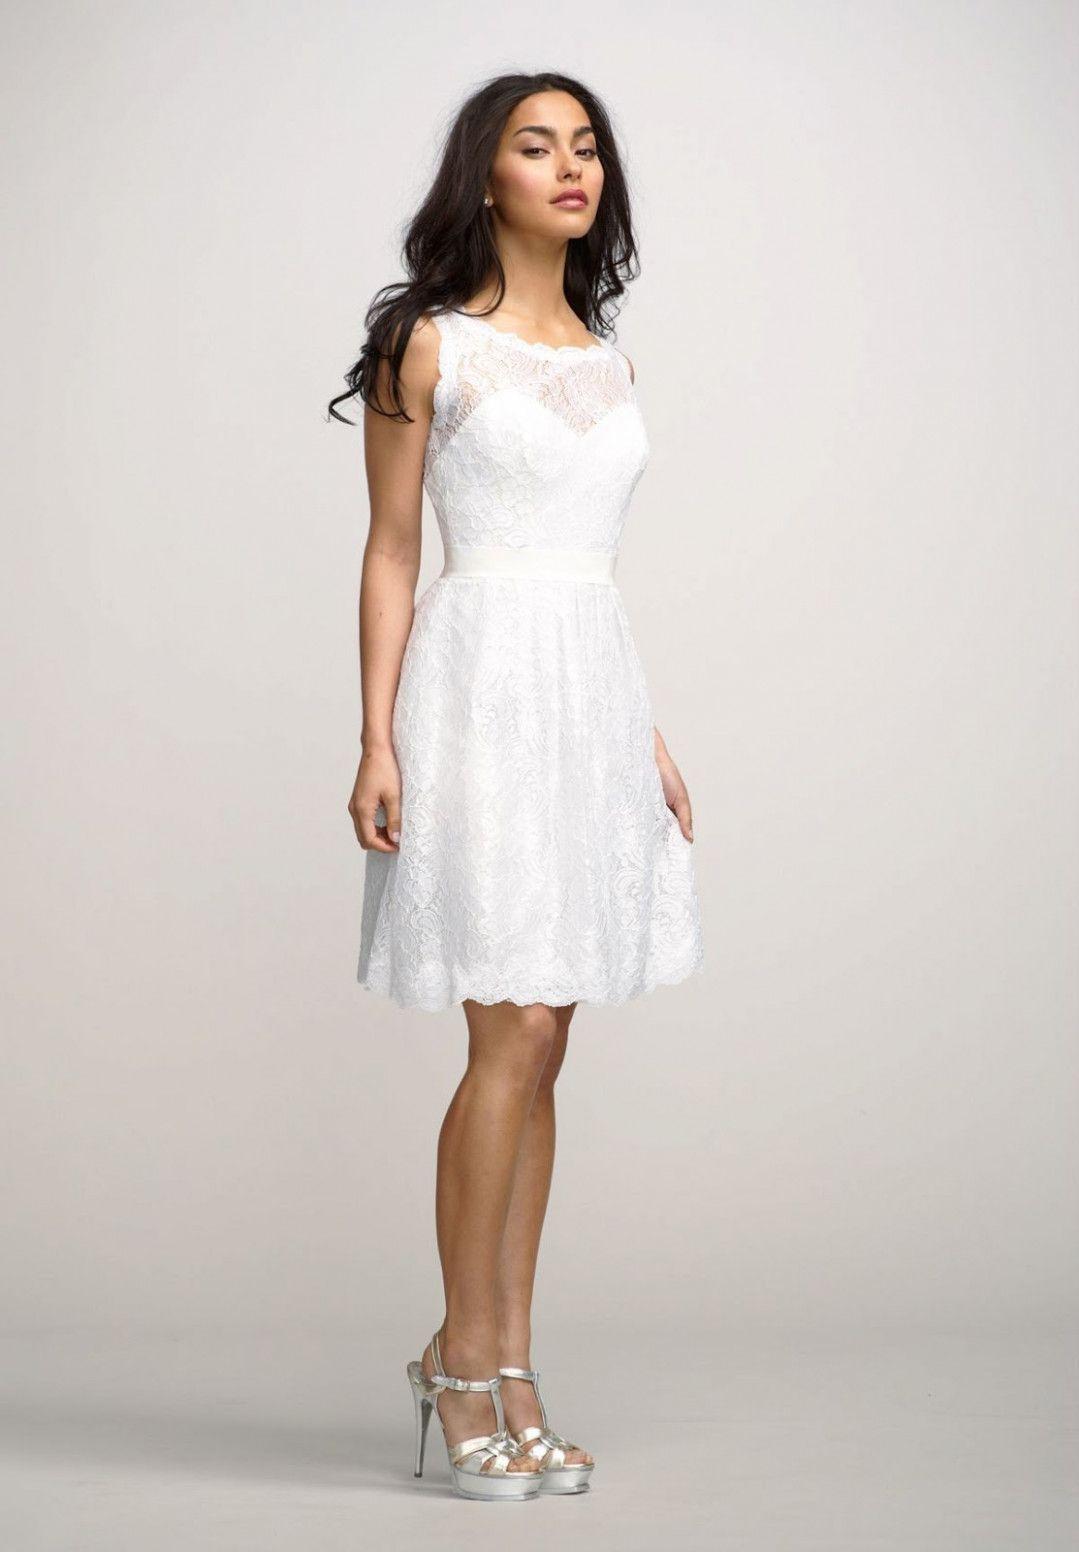 Wedding reception dresses wedding decorations tips pinterest